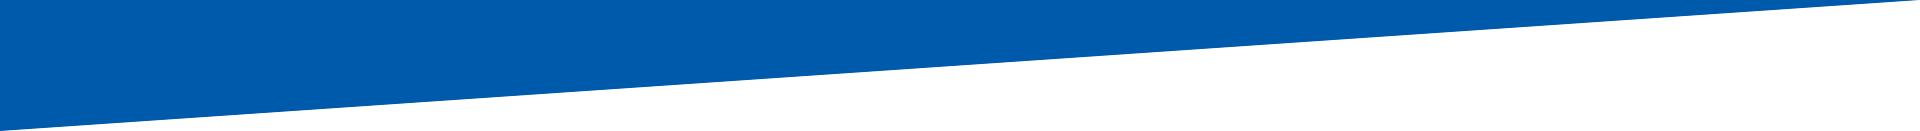 Hội thảo giới thiệu sản phẩm mới: NEXIEZ- MR, NEXIEZ-MRL, NEXWAY- S AP2